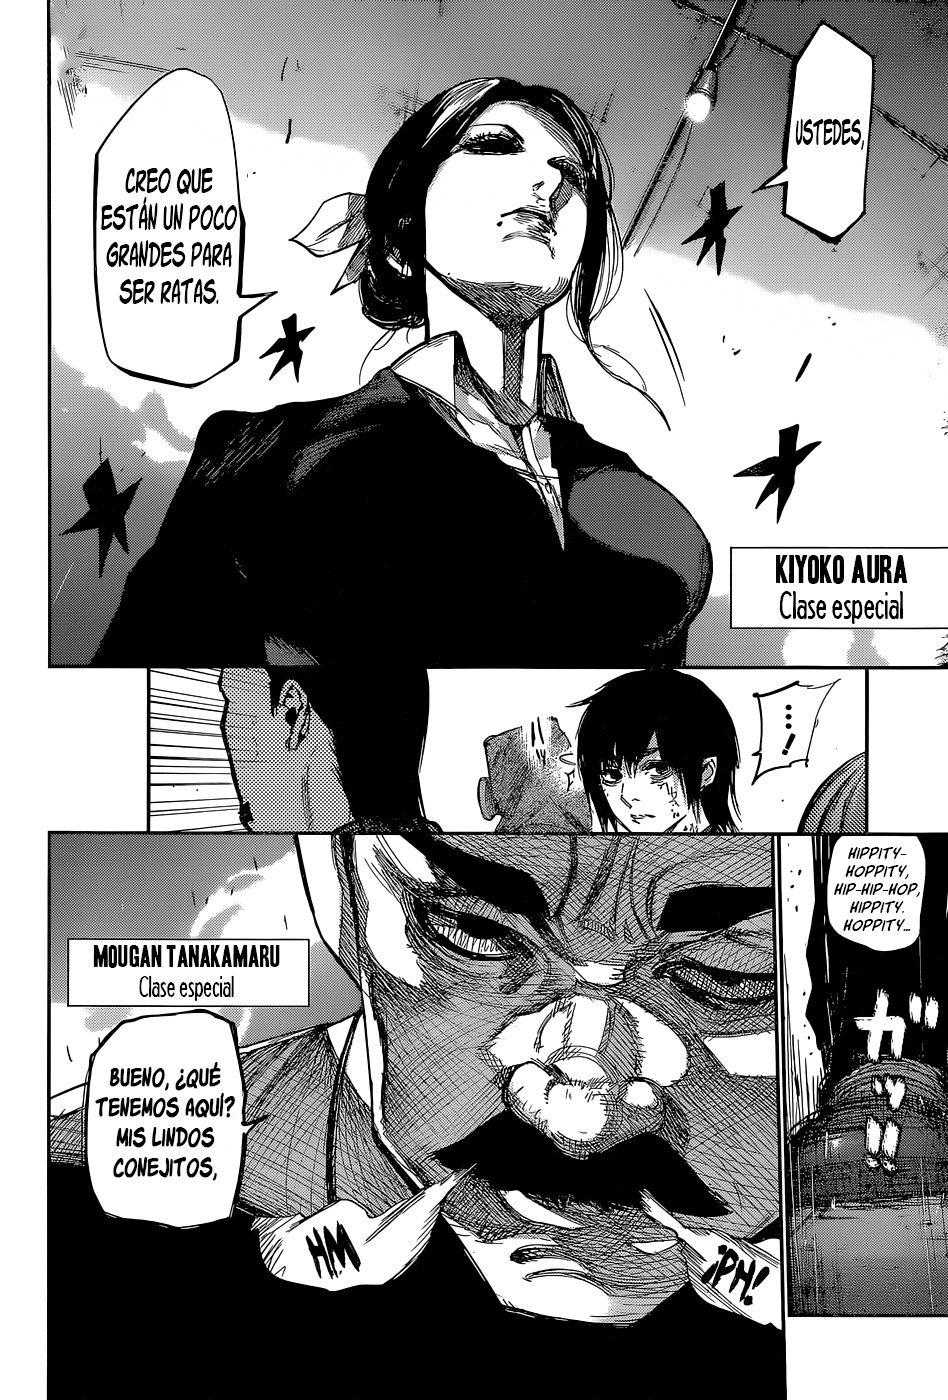 https://c5.ninemanga.com/es_manga/59/59/482473/a0833c8a1817526ac555f8d67727caf6.jpg Page 4